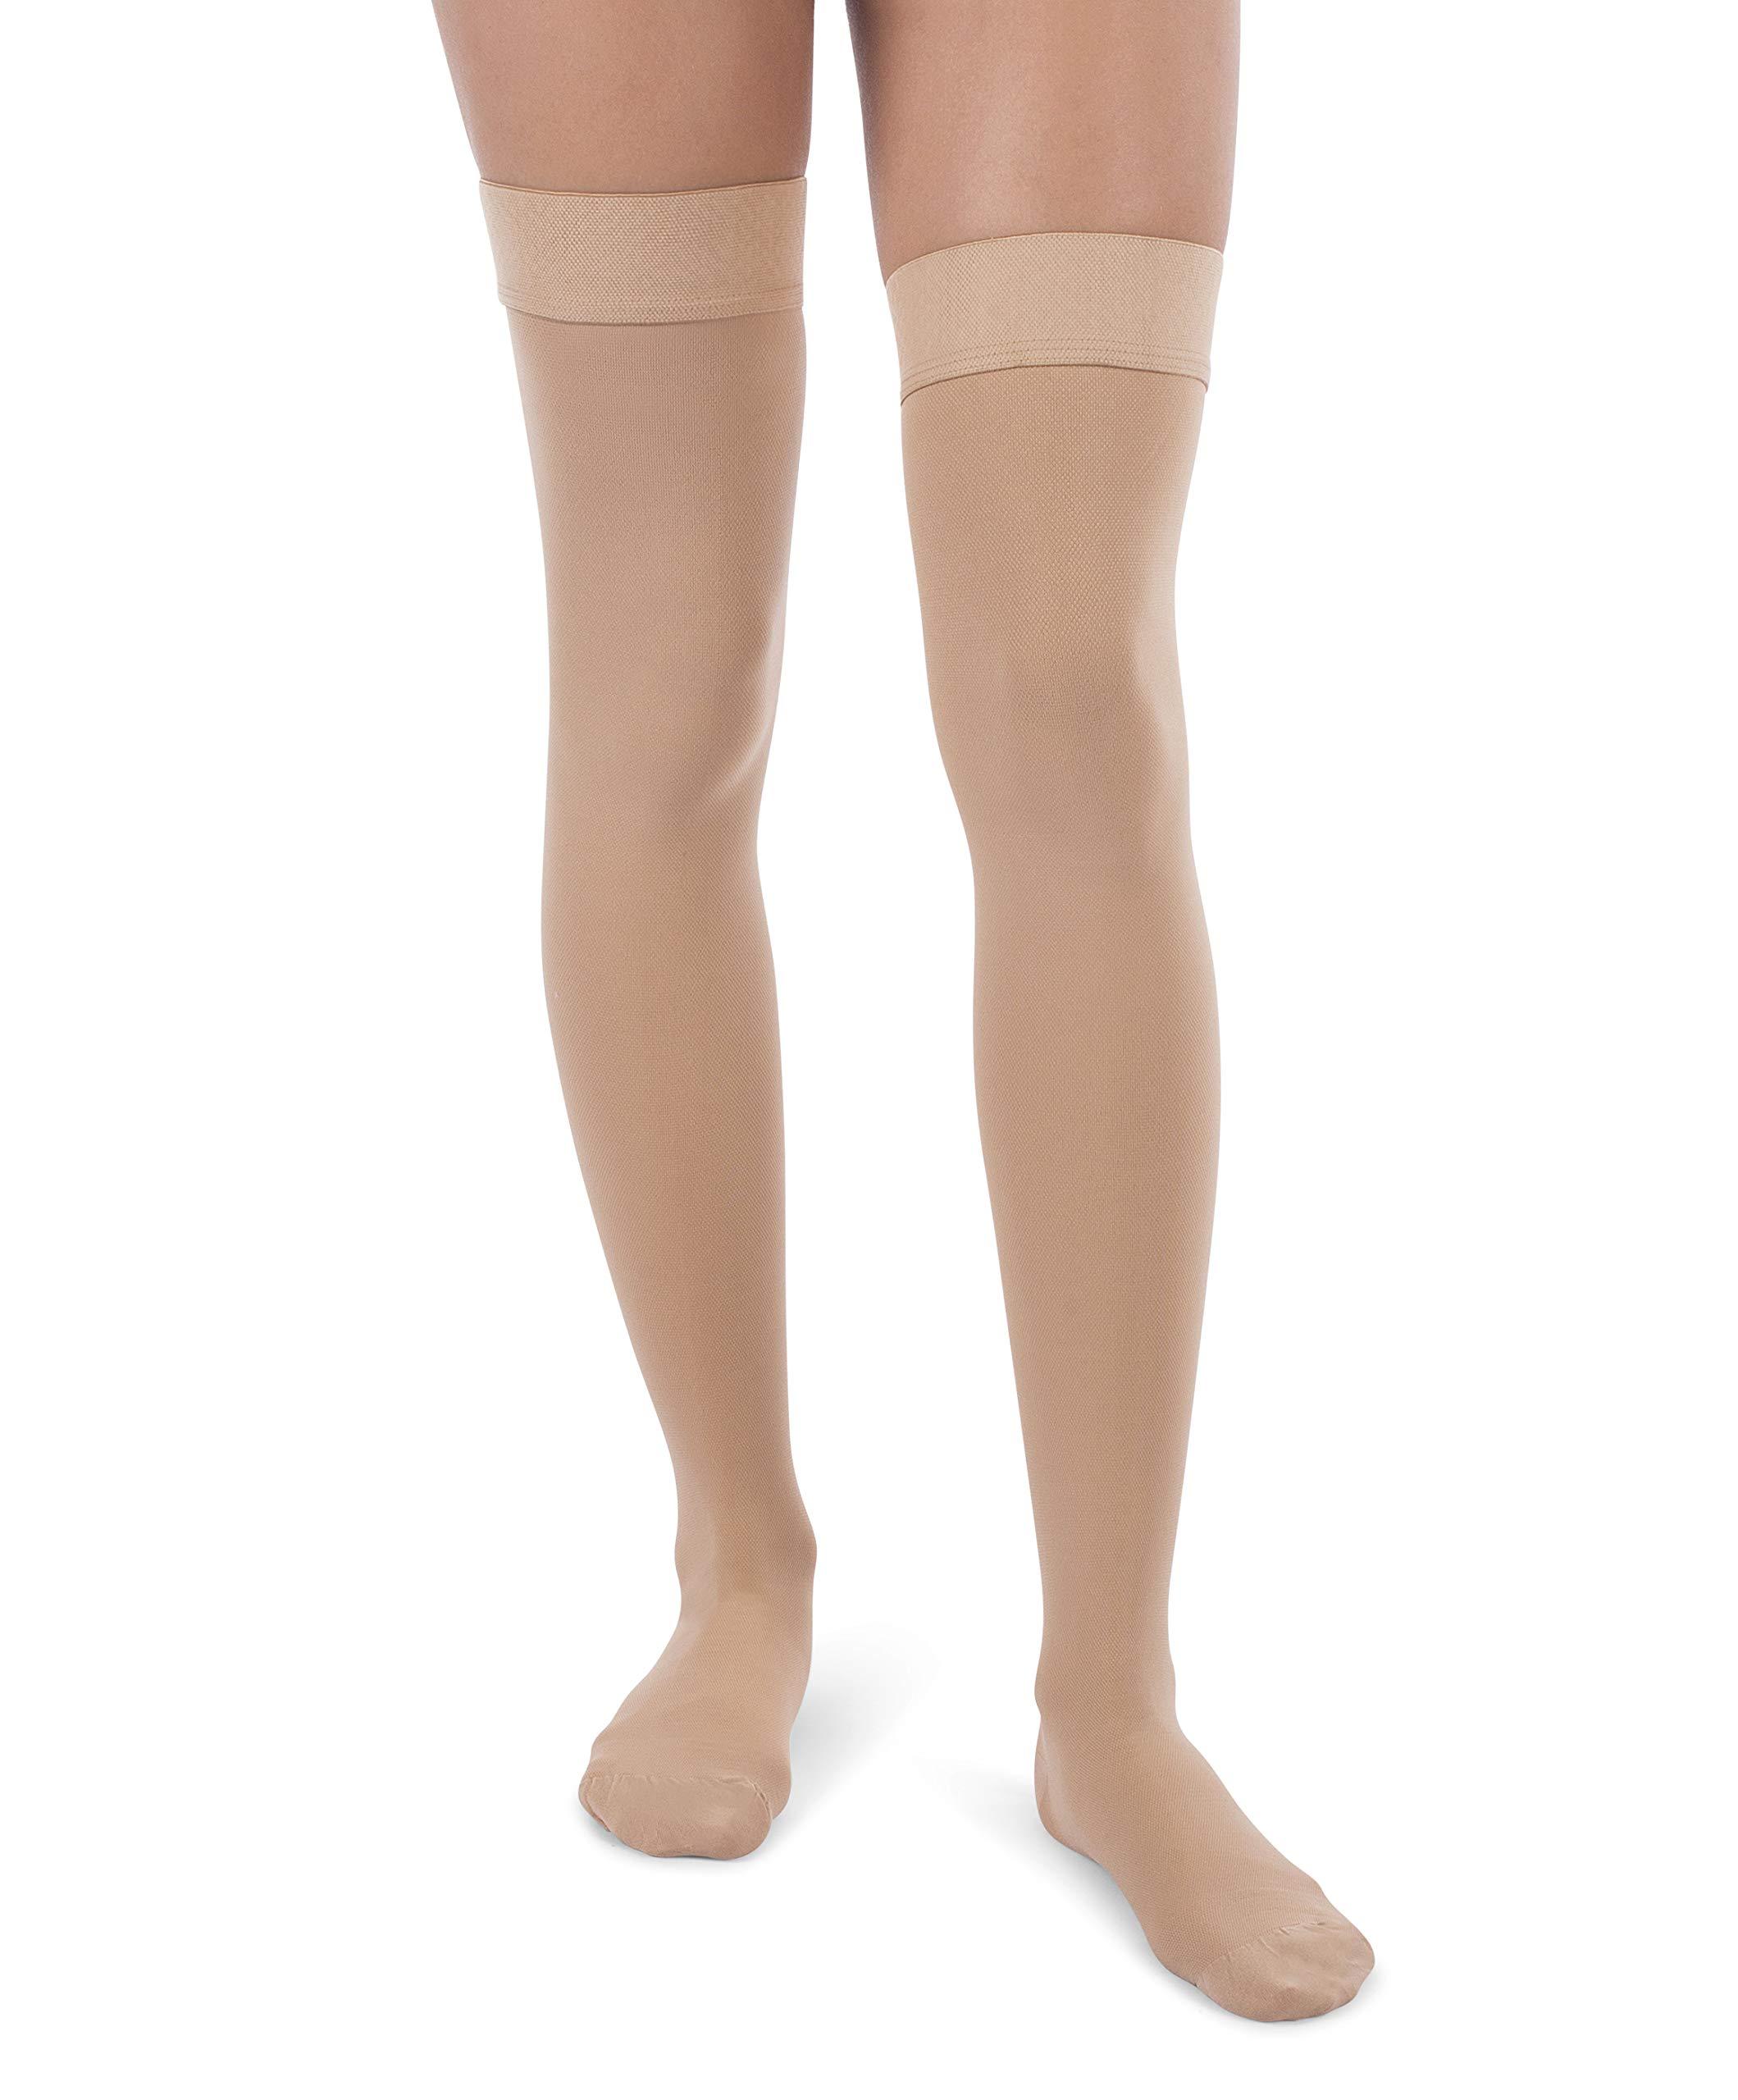 944a9d1a0e1 Amazon.com  Jomi Compression Thigh High Stockings Collection